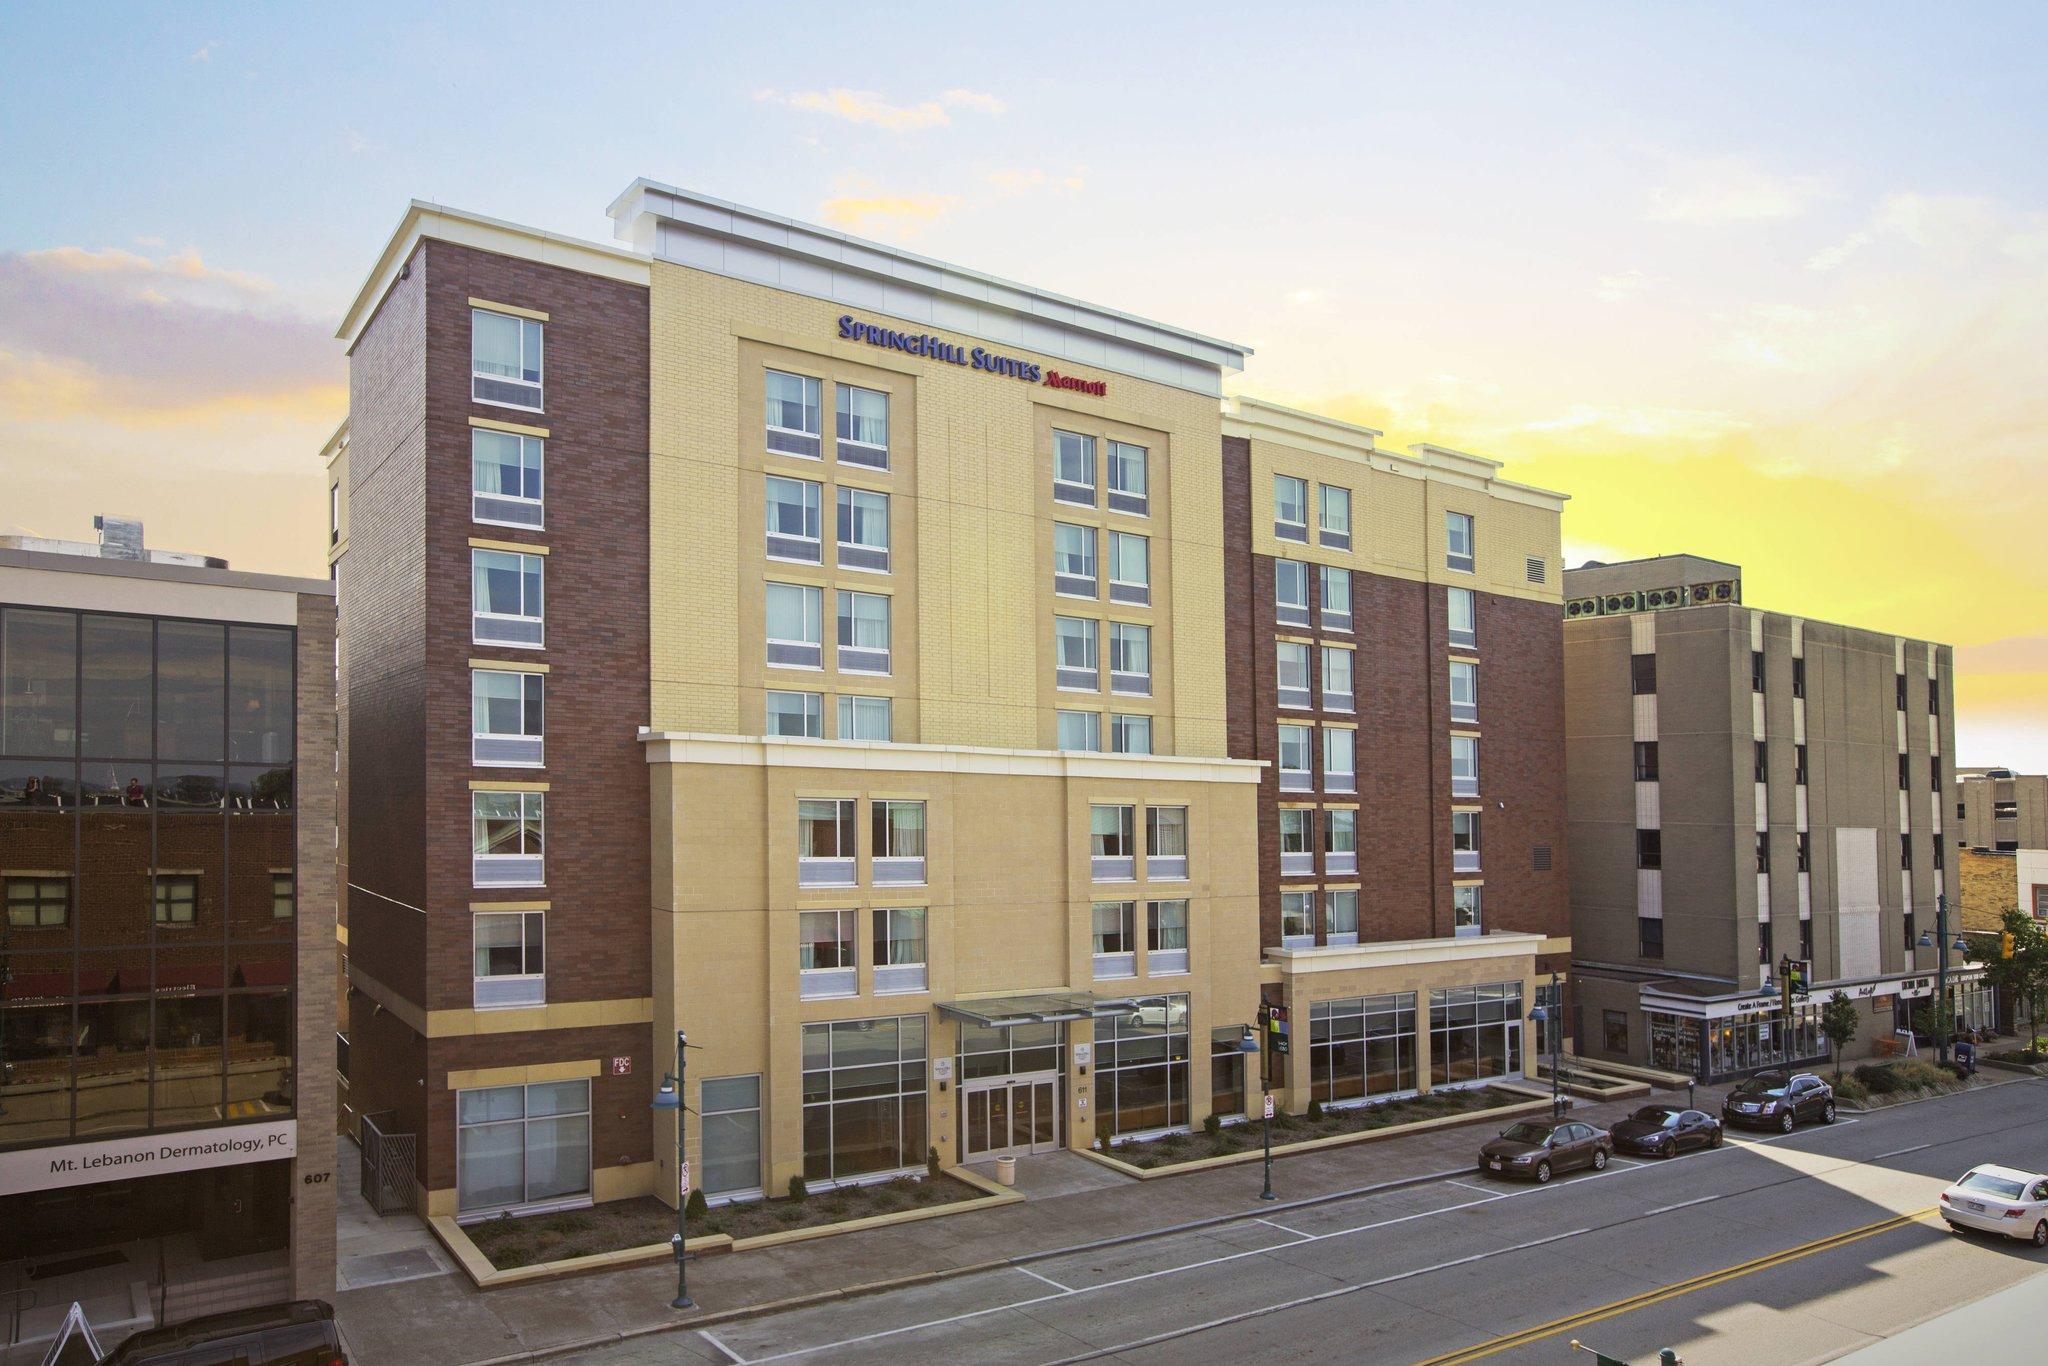 SpringHill Suites Pittsburgh/Mt Lebanon